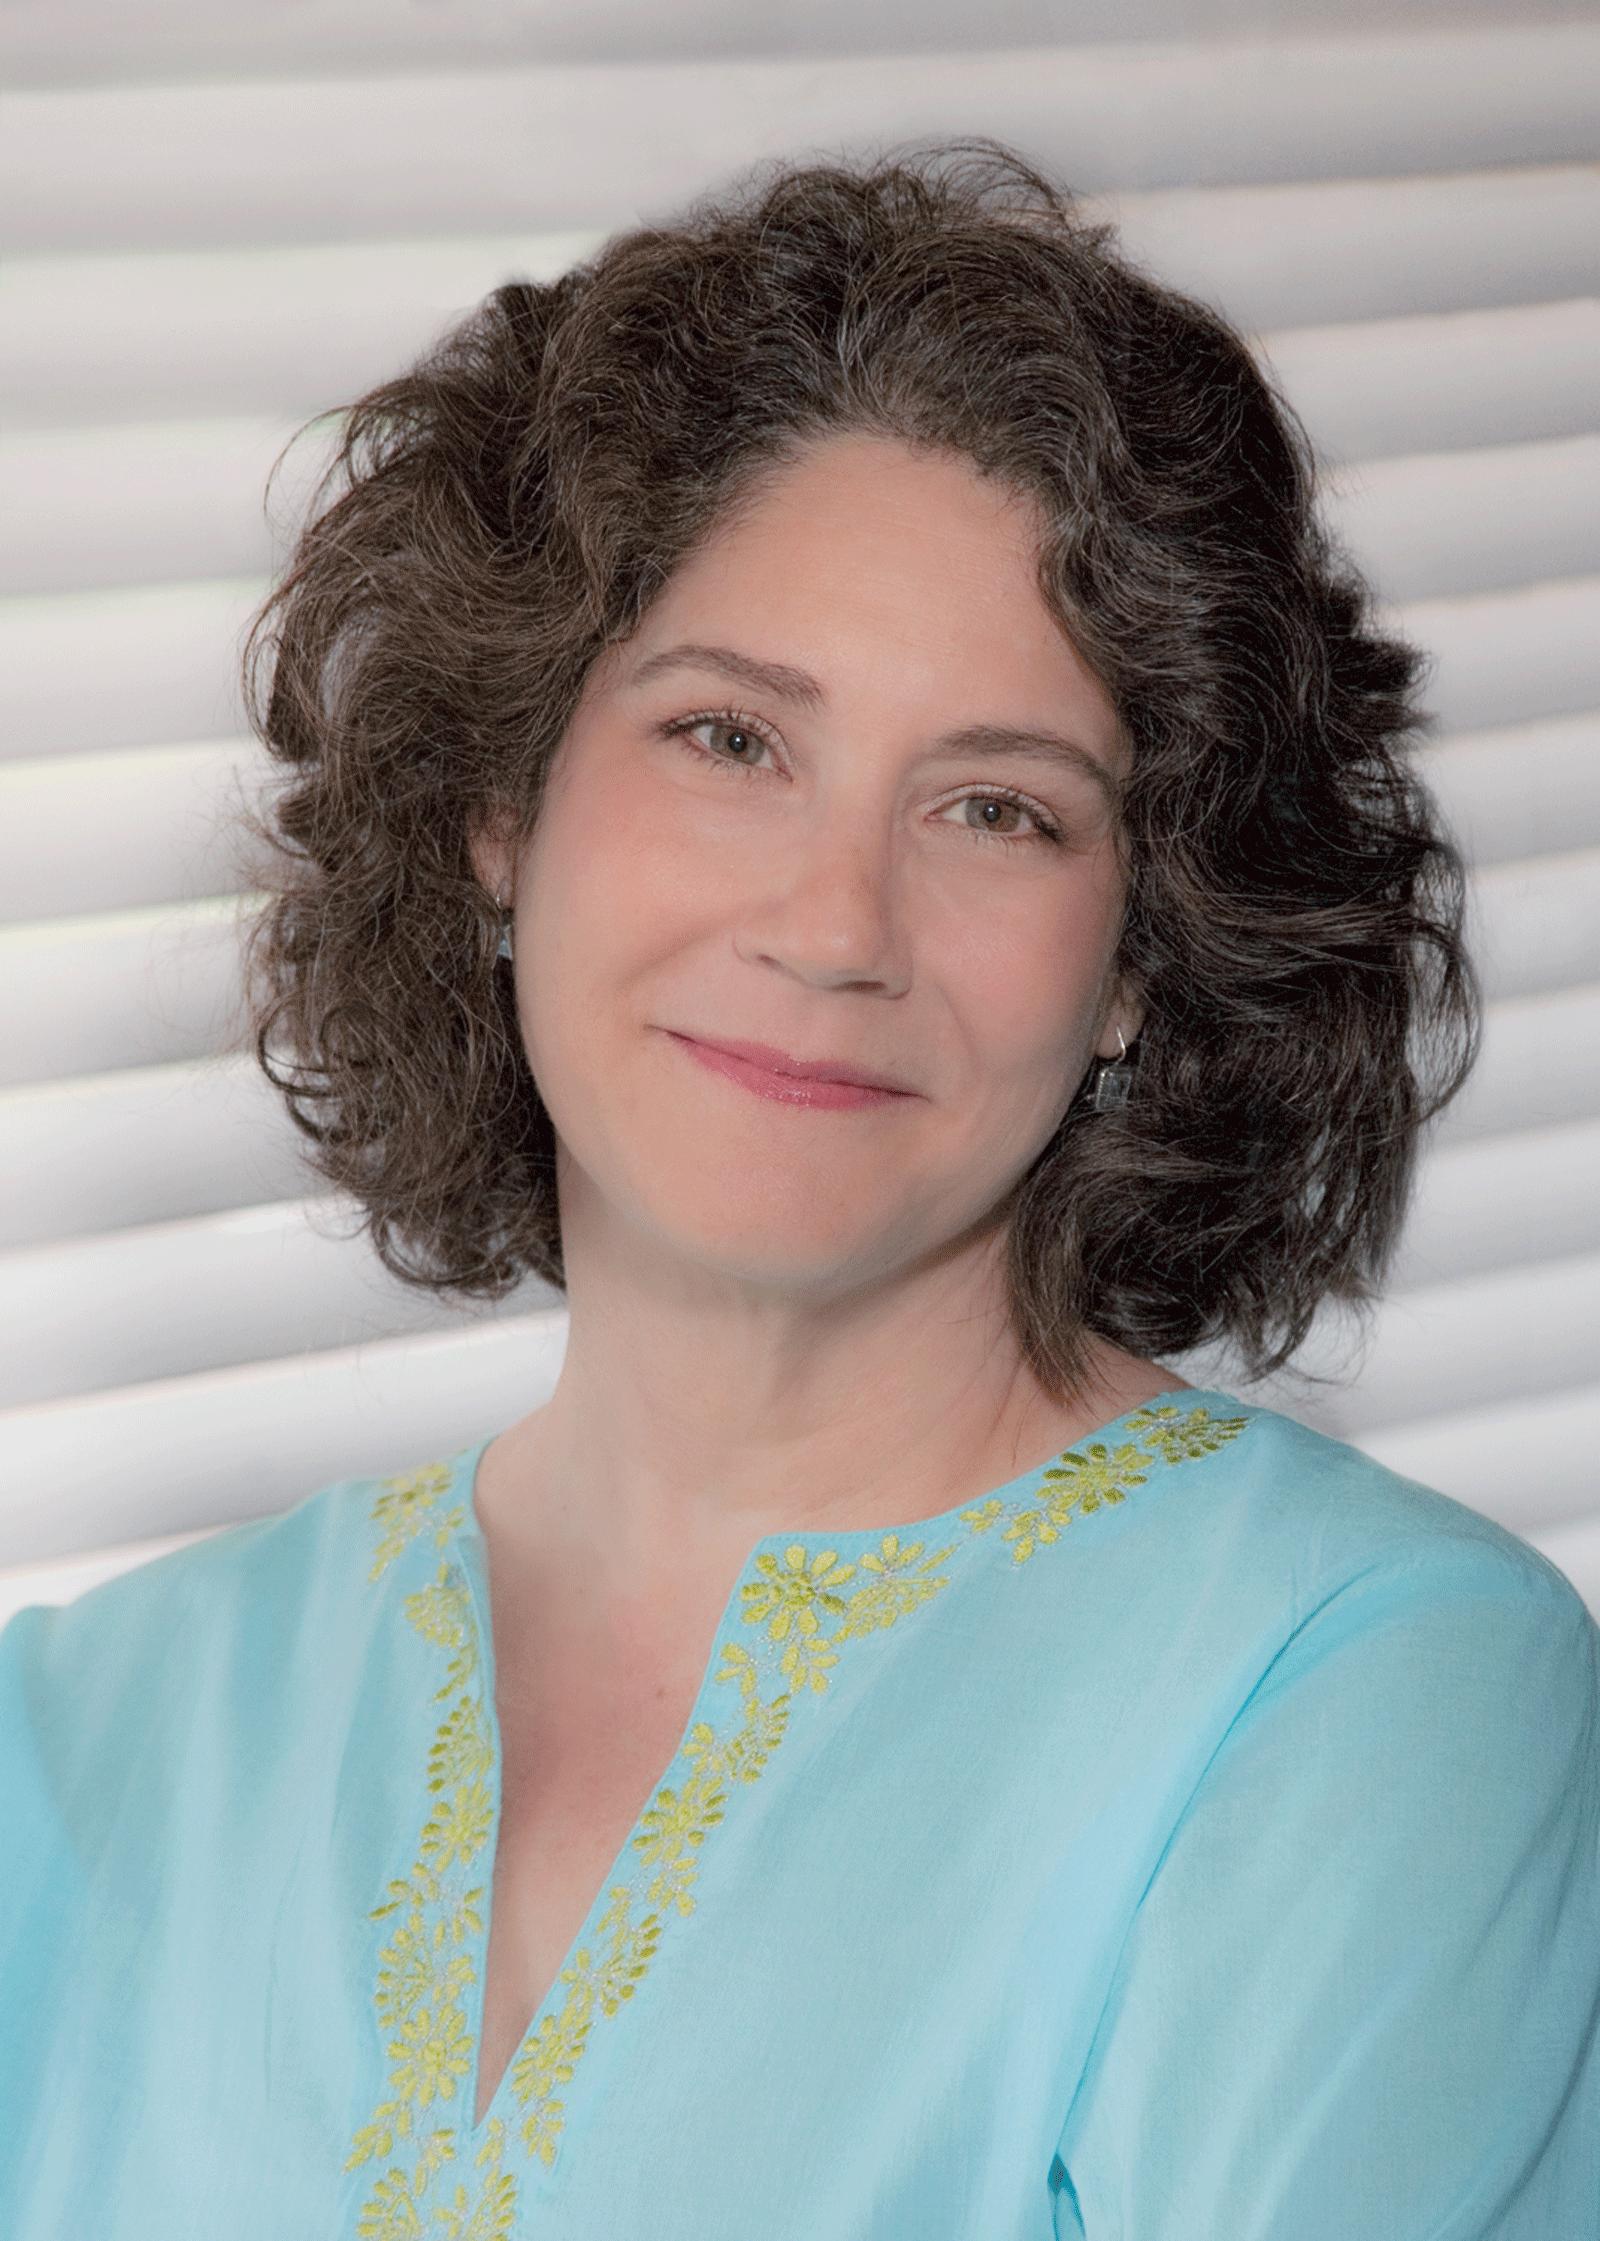 Sharon Silver